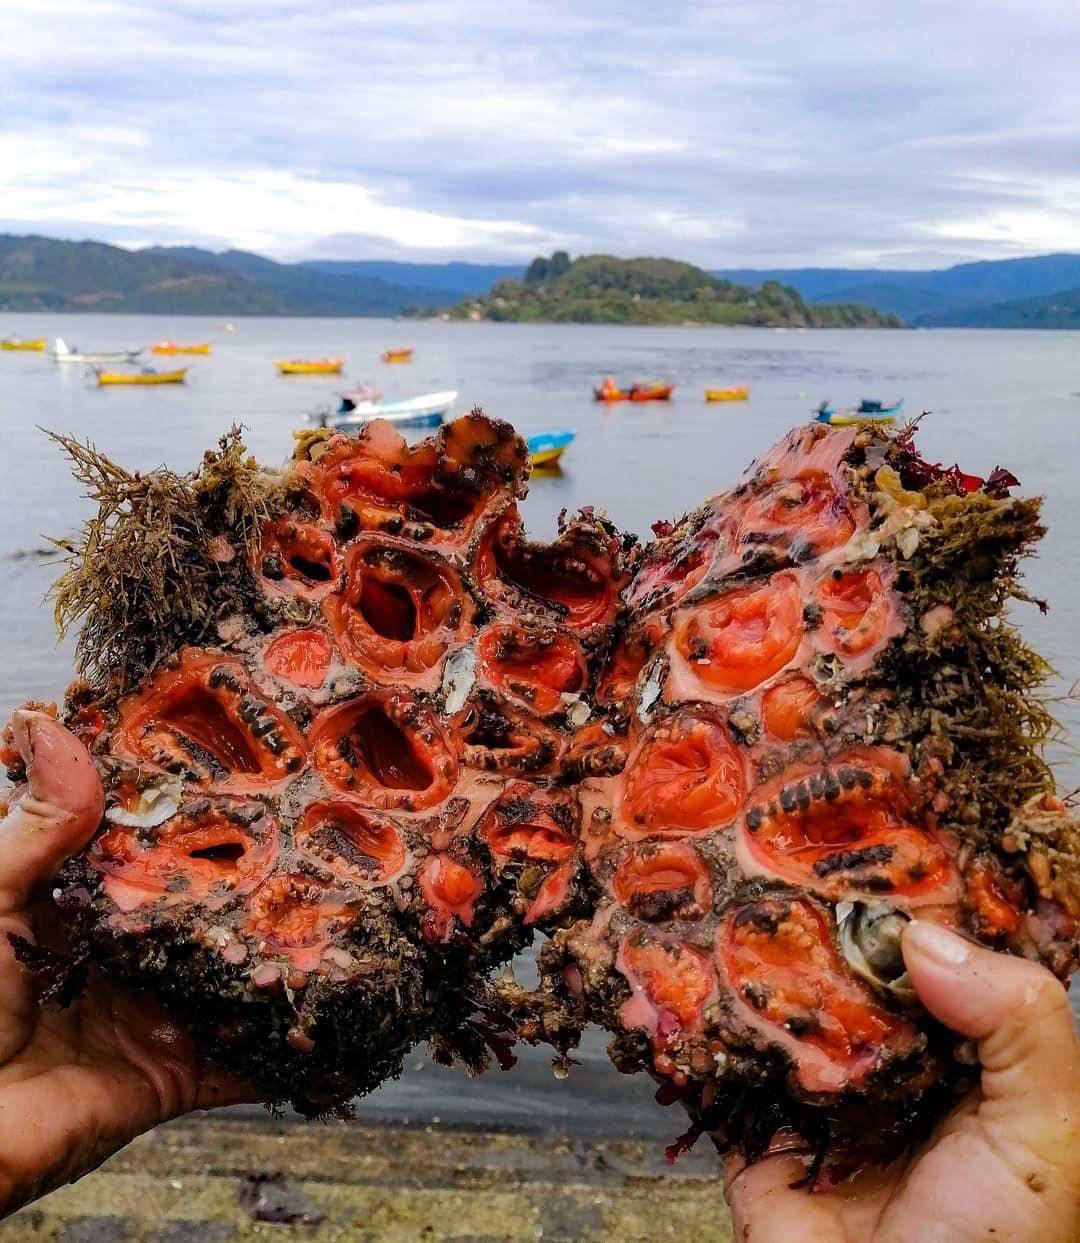 Piures off the coast of Chile